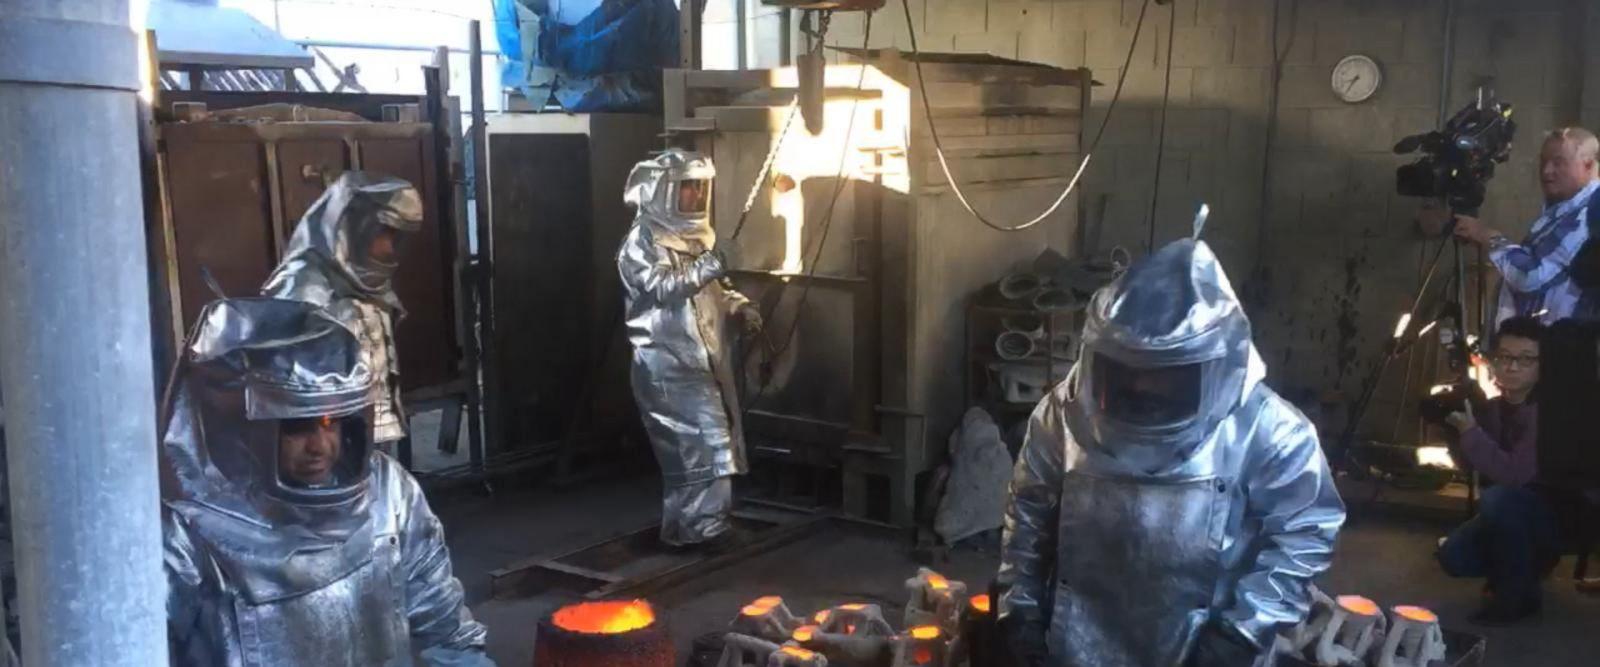 VIDEO: Sculpting An Icon: Making the SAG Award